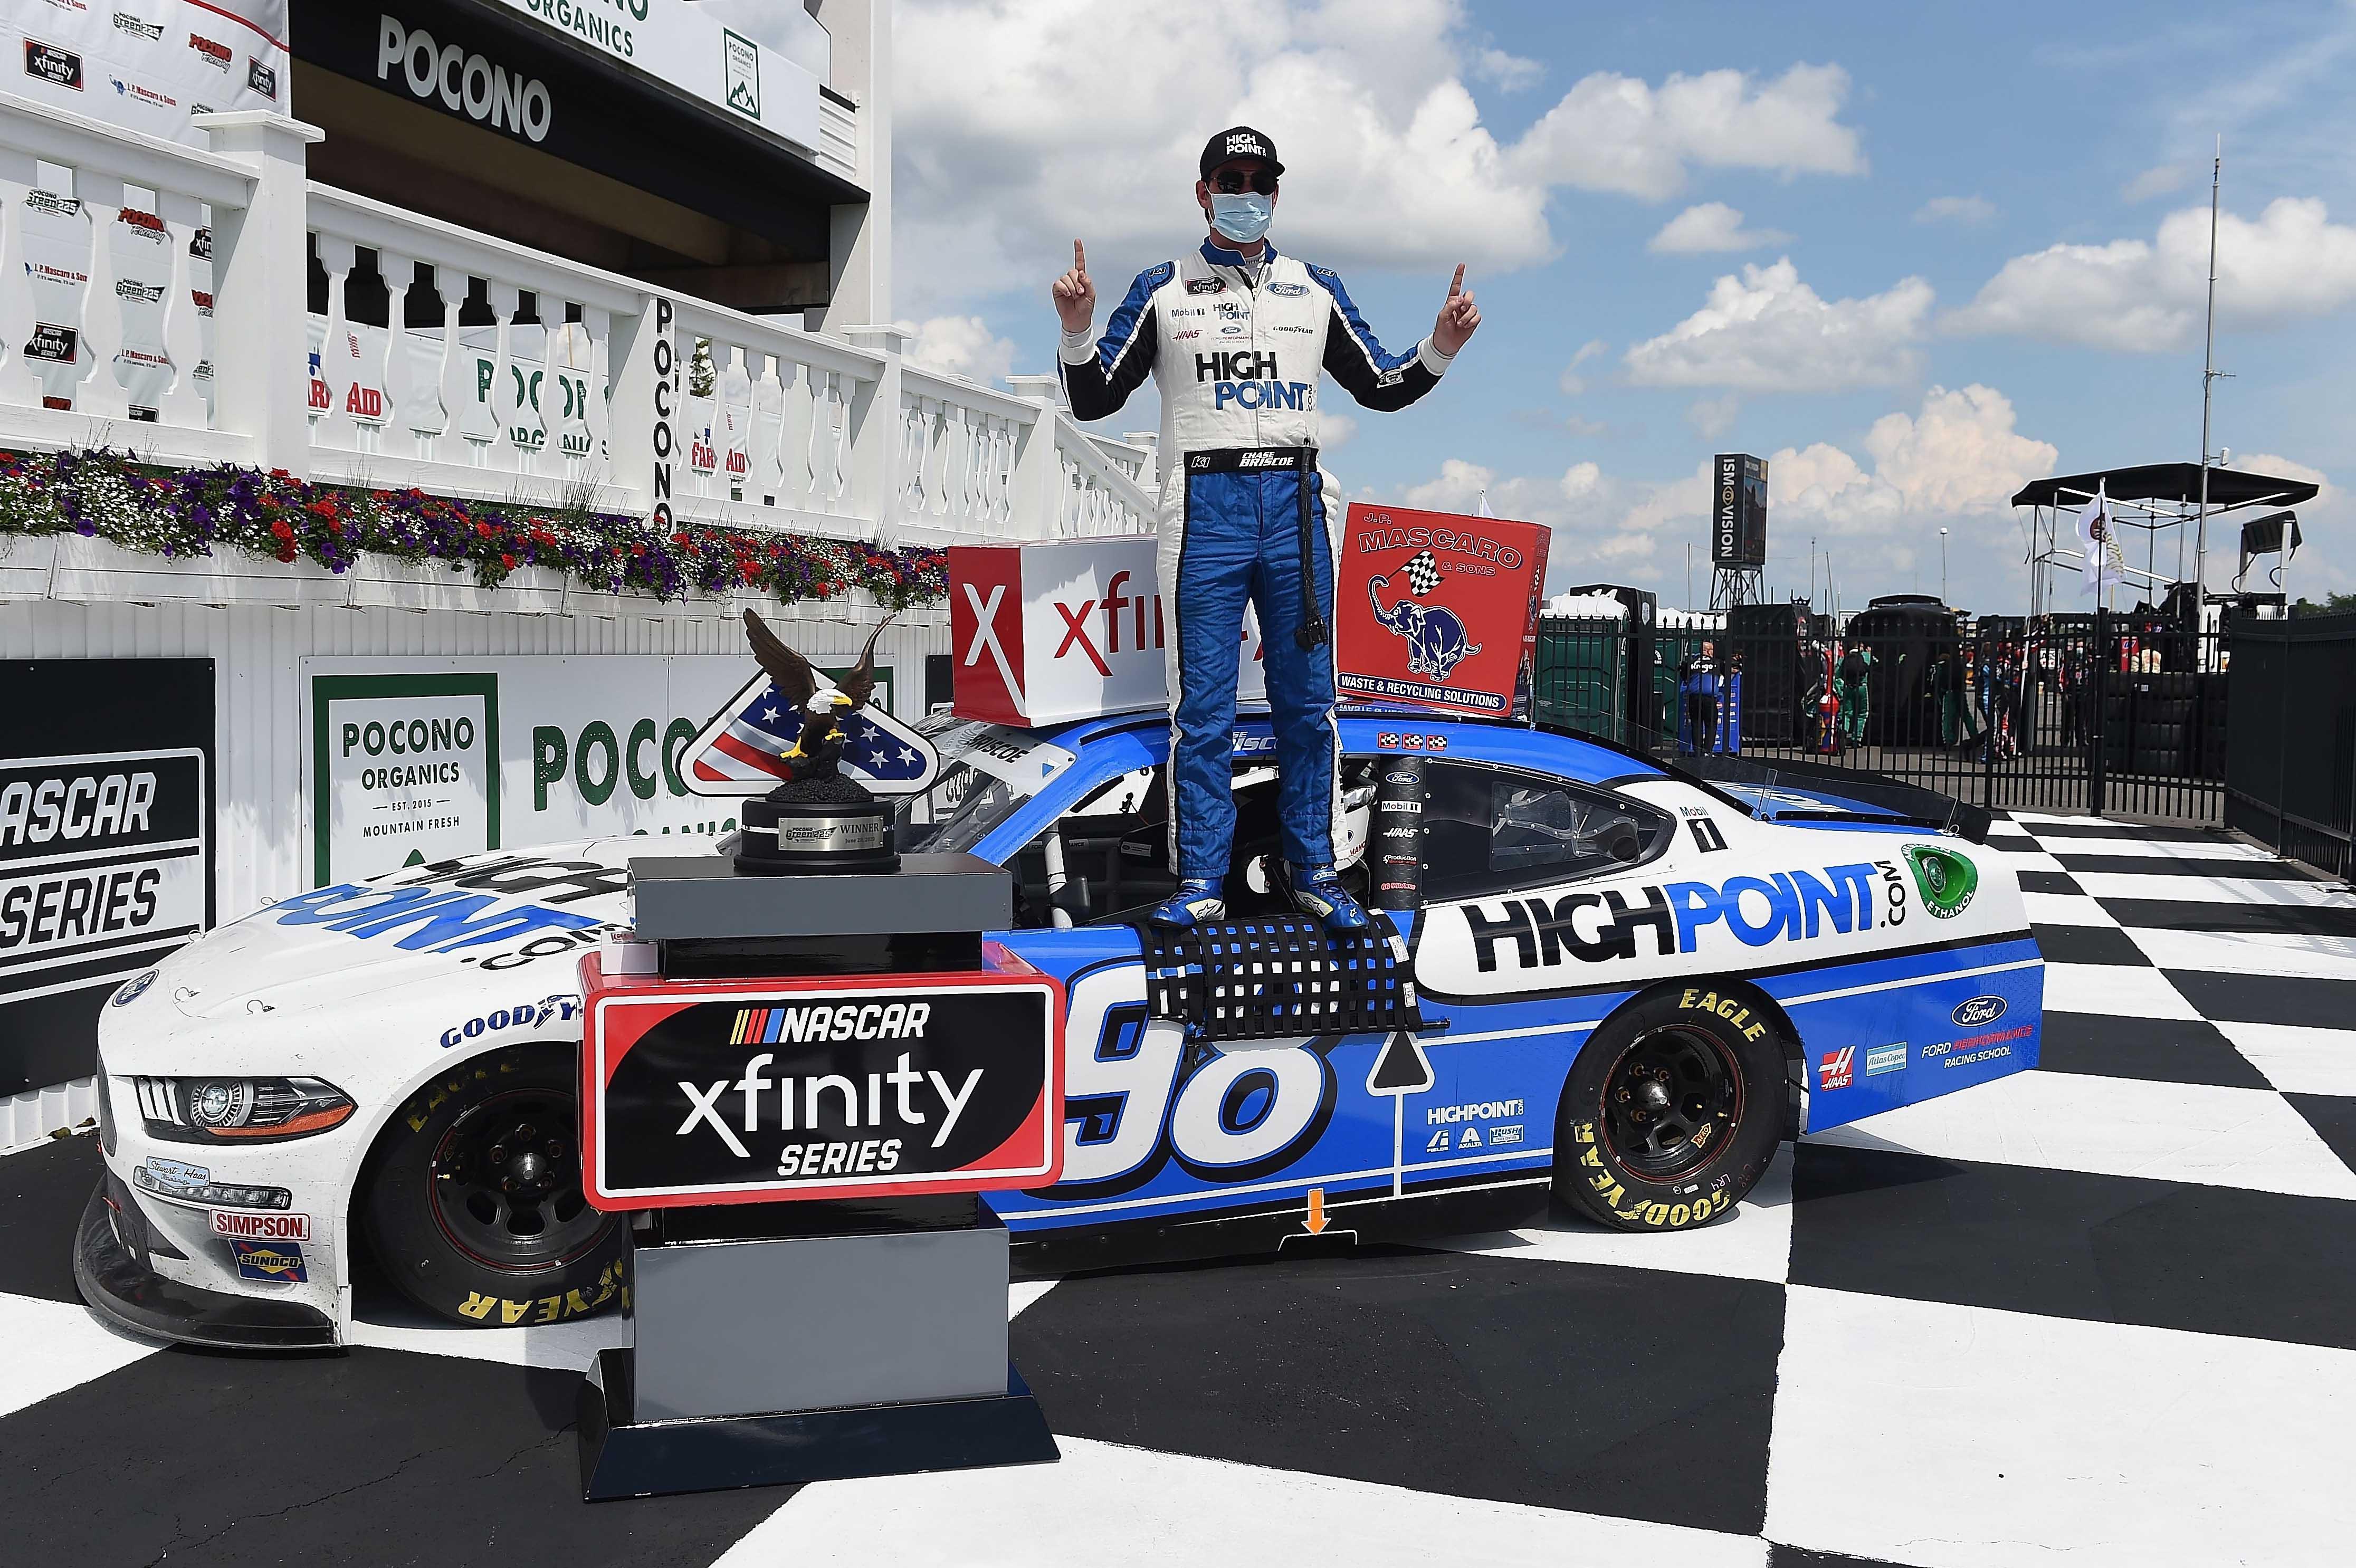 Chase Briscoe in victory lane at Pocono Raceway - NASCAR Xfinity Series